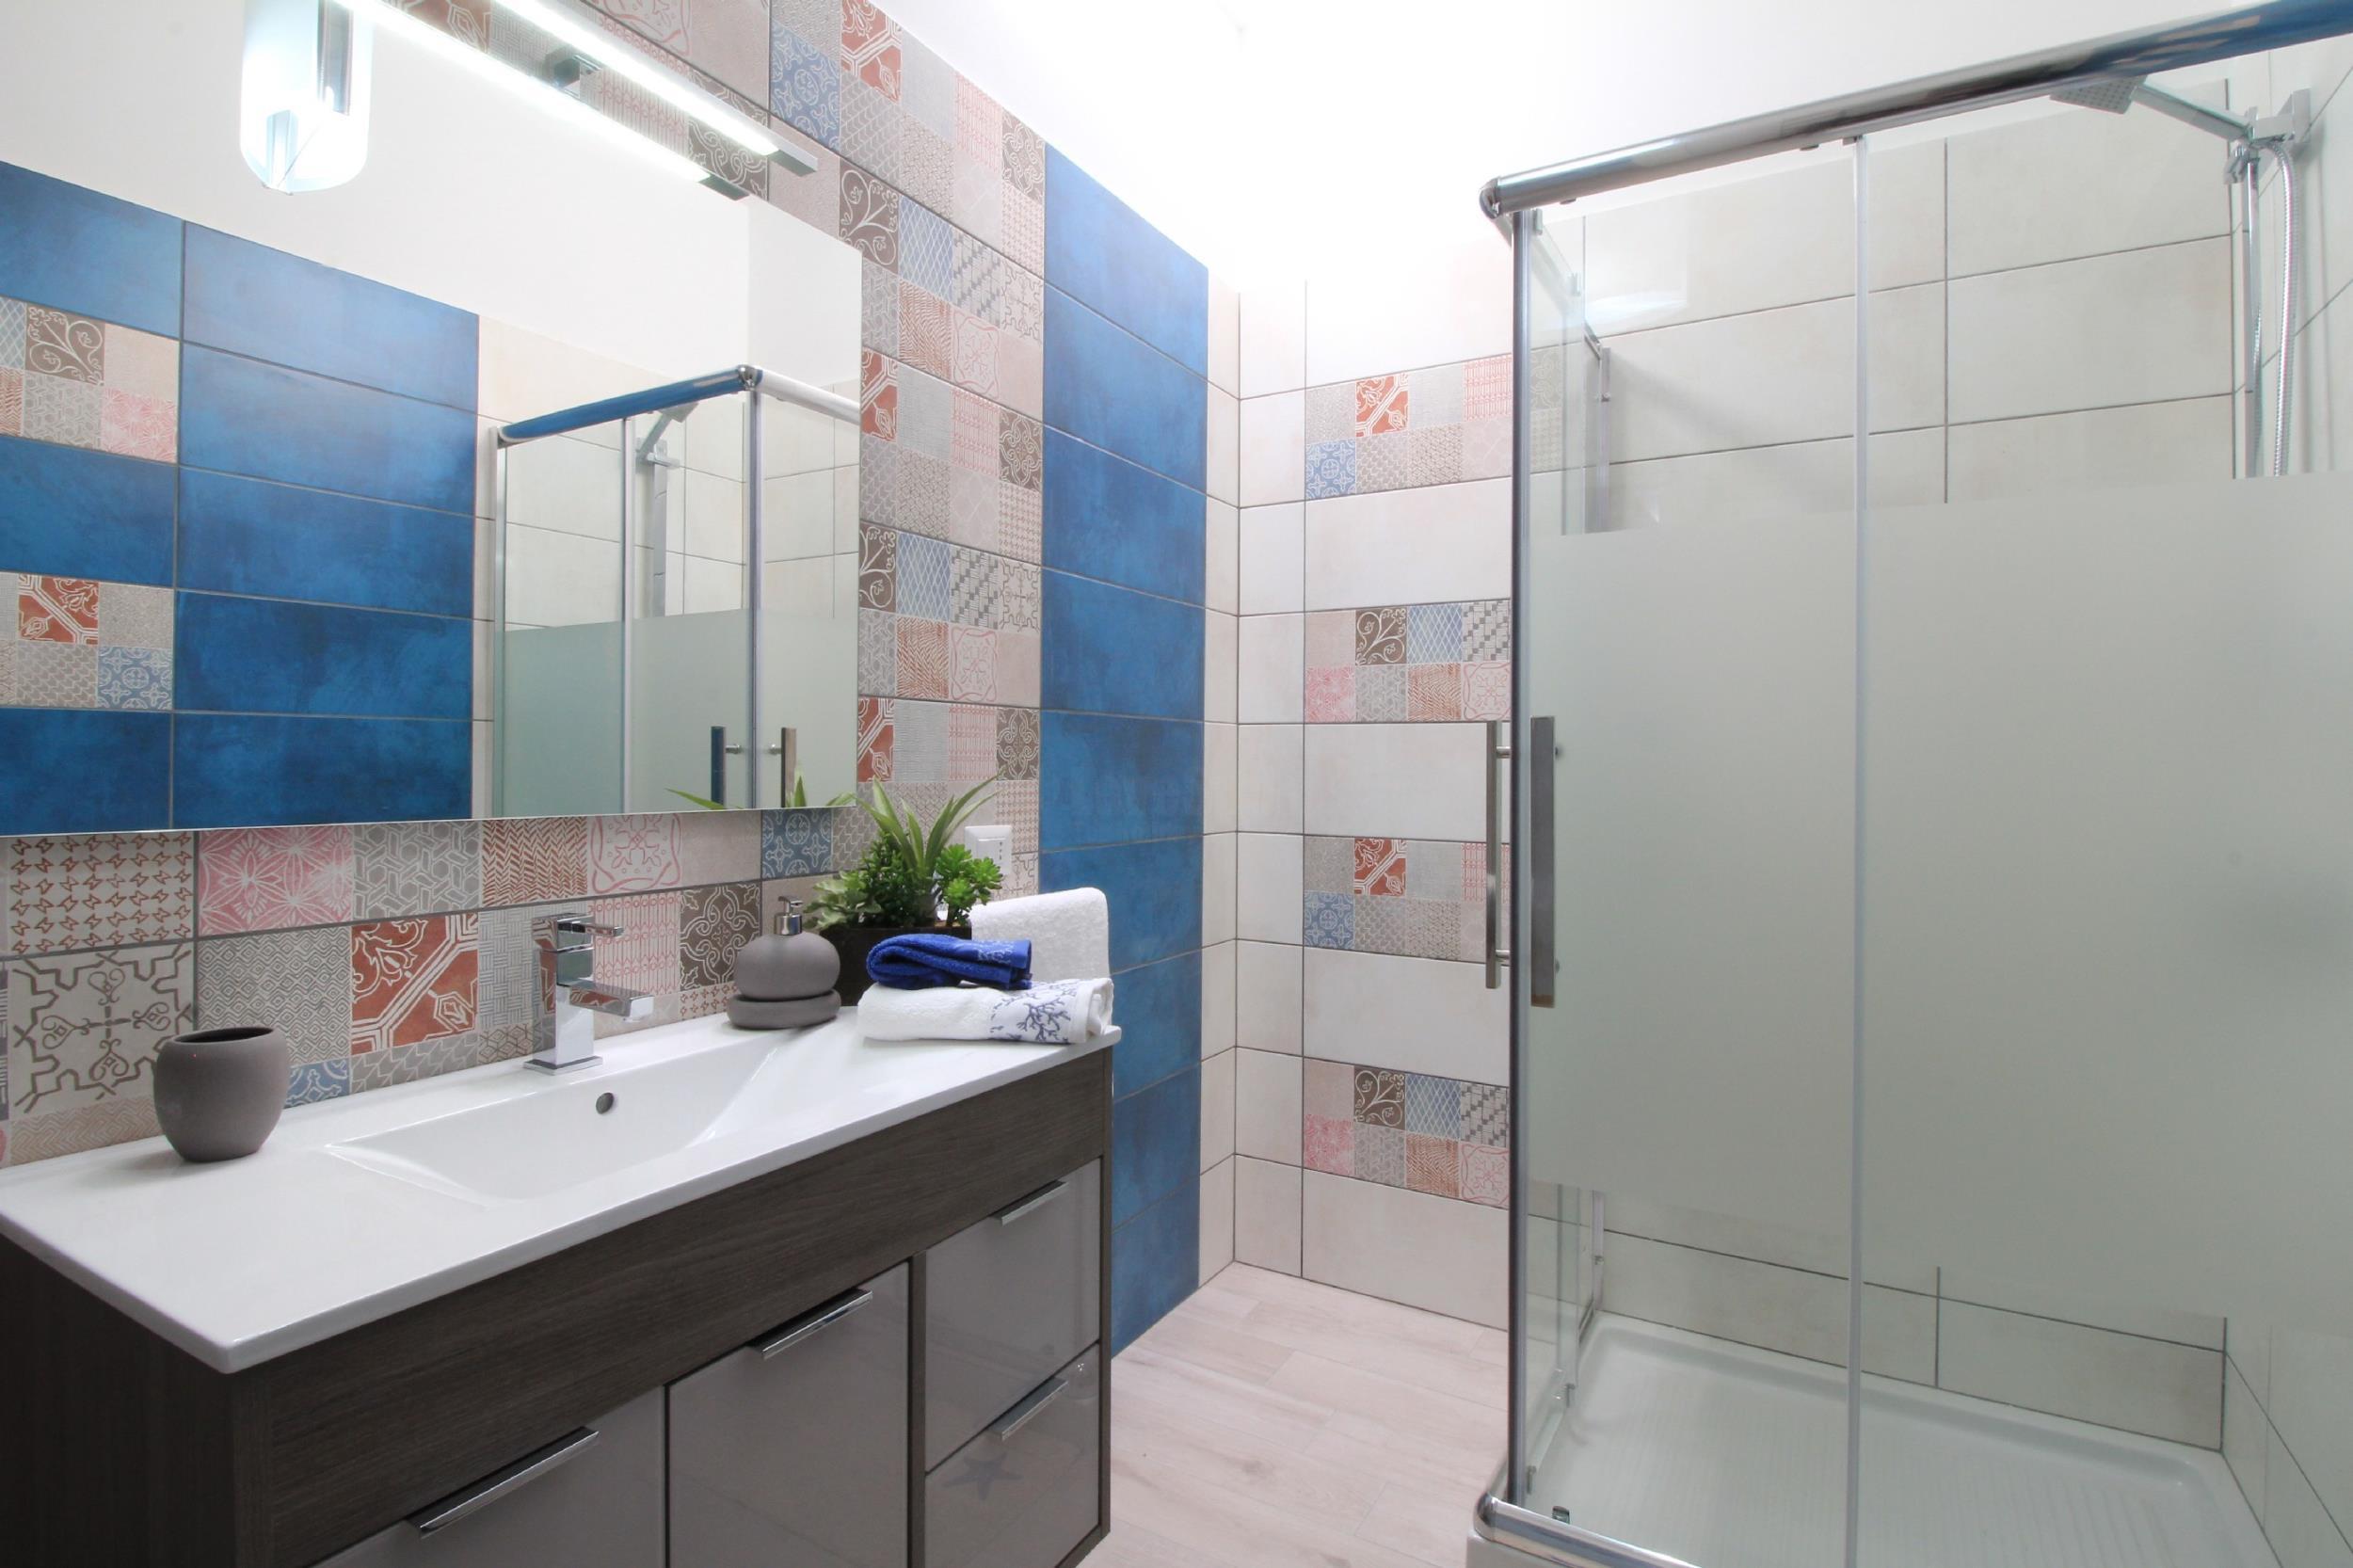 Apartment Elcisia luxe beach house photo 23457111